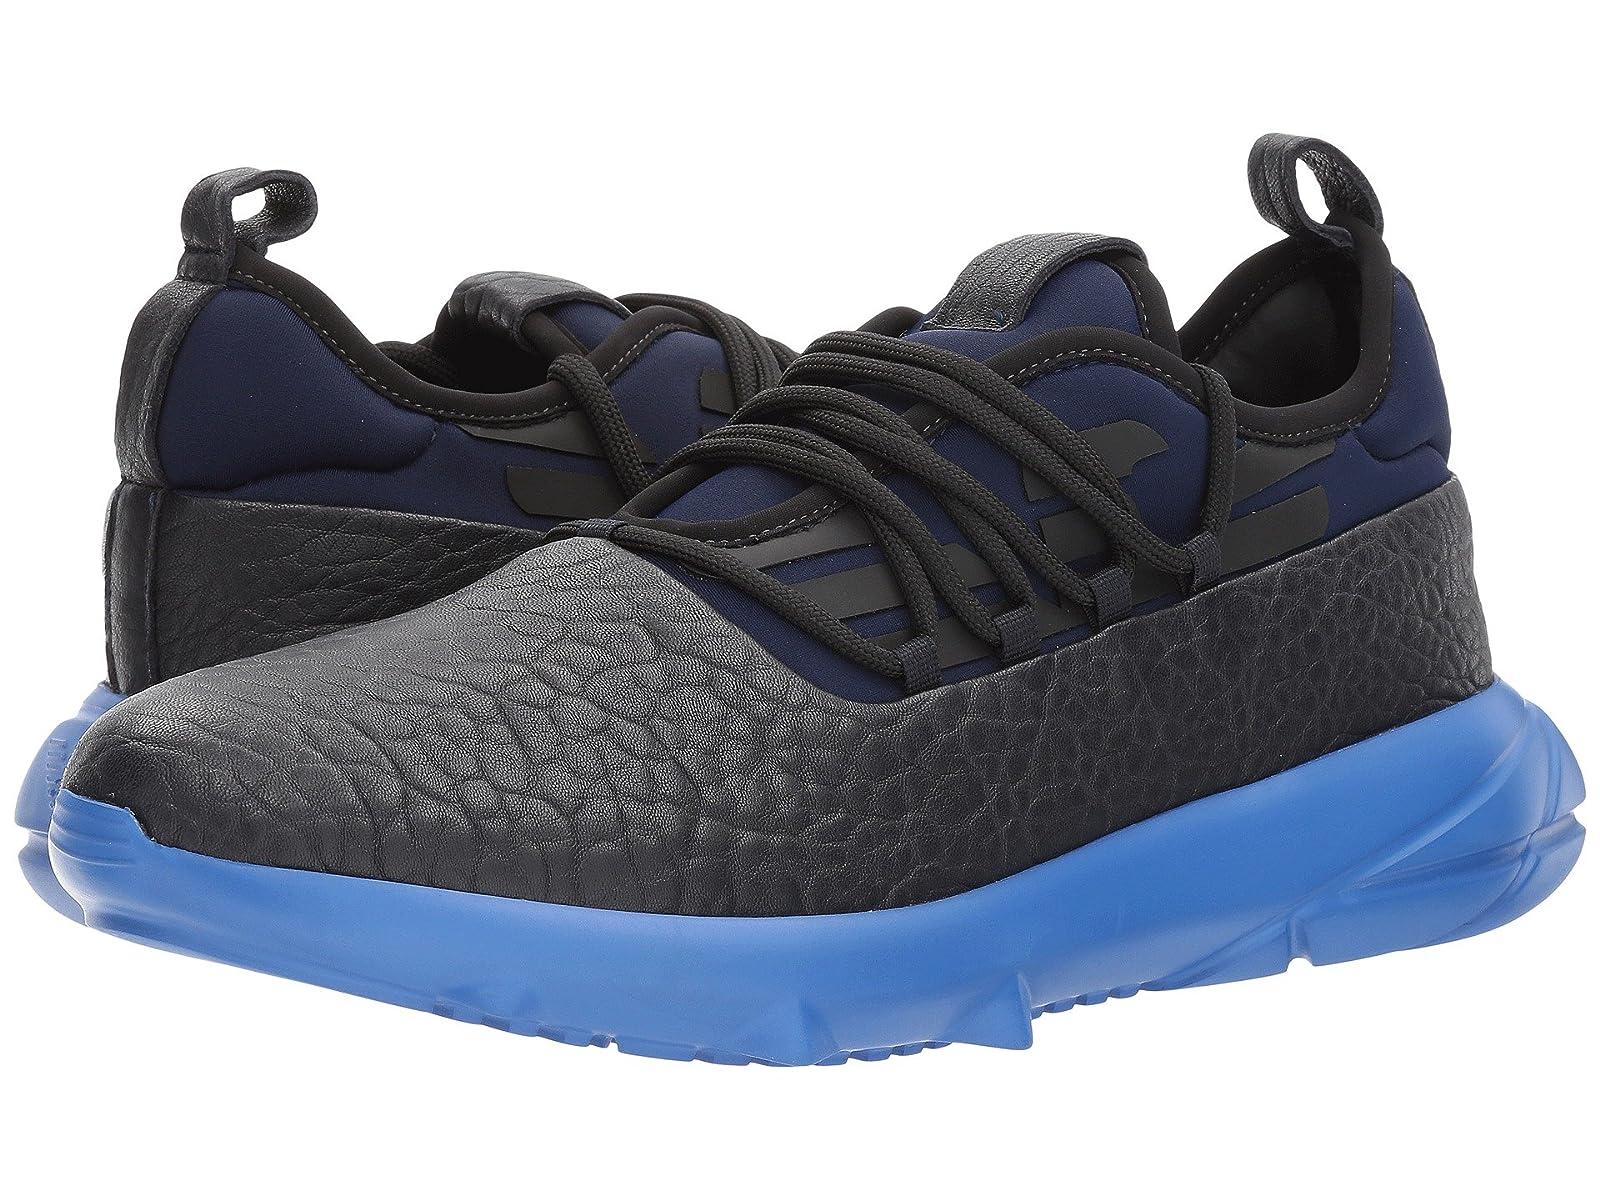 Emporio Armani Neoprene SneakerCheap and distinctive eye-catching shoes